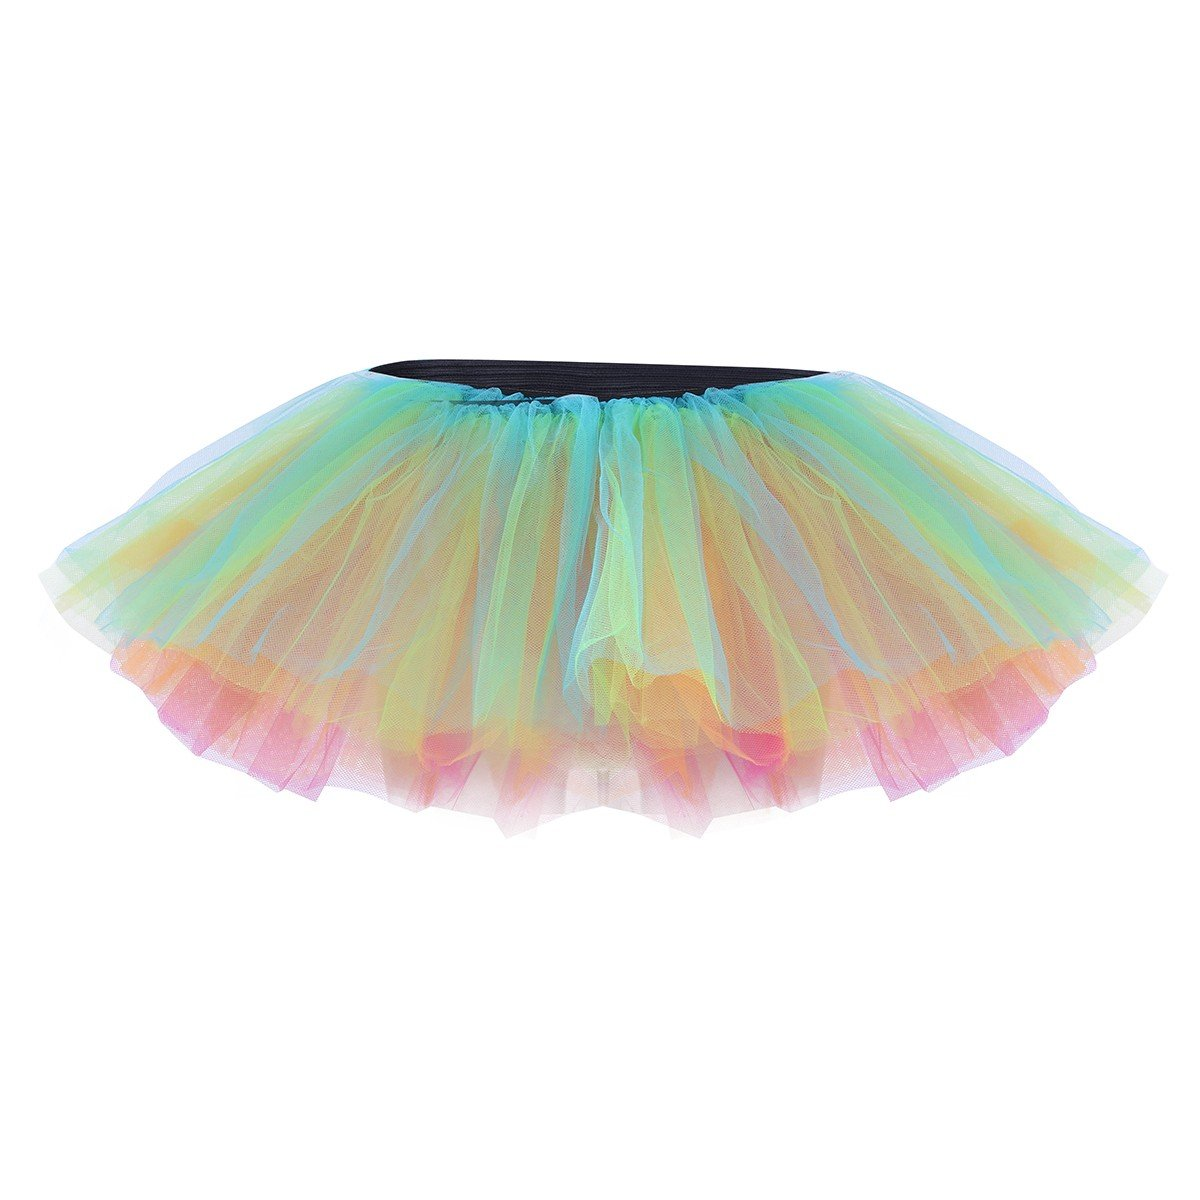 f707448c1ef TiaoBug Tutu Ballet Robe Femme Adulte Tulle 5 Couches Déguisement Costume  Femme Tutu Danse Cosplay Femme Mini Jupe